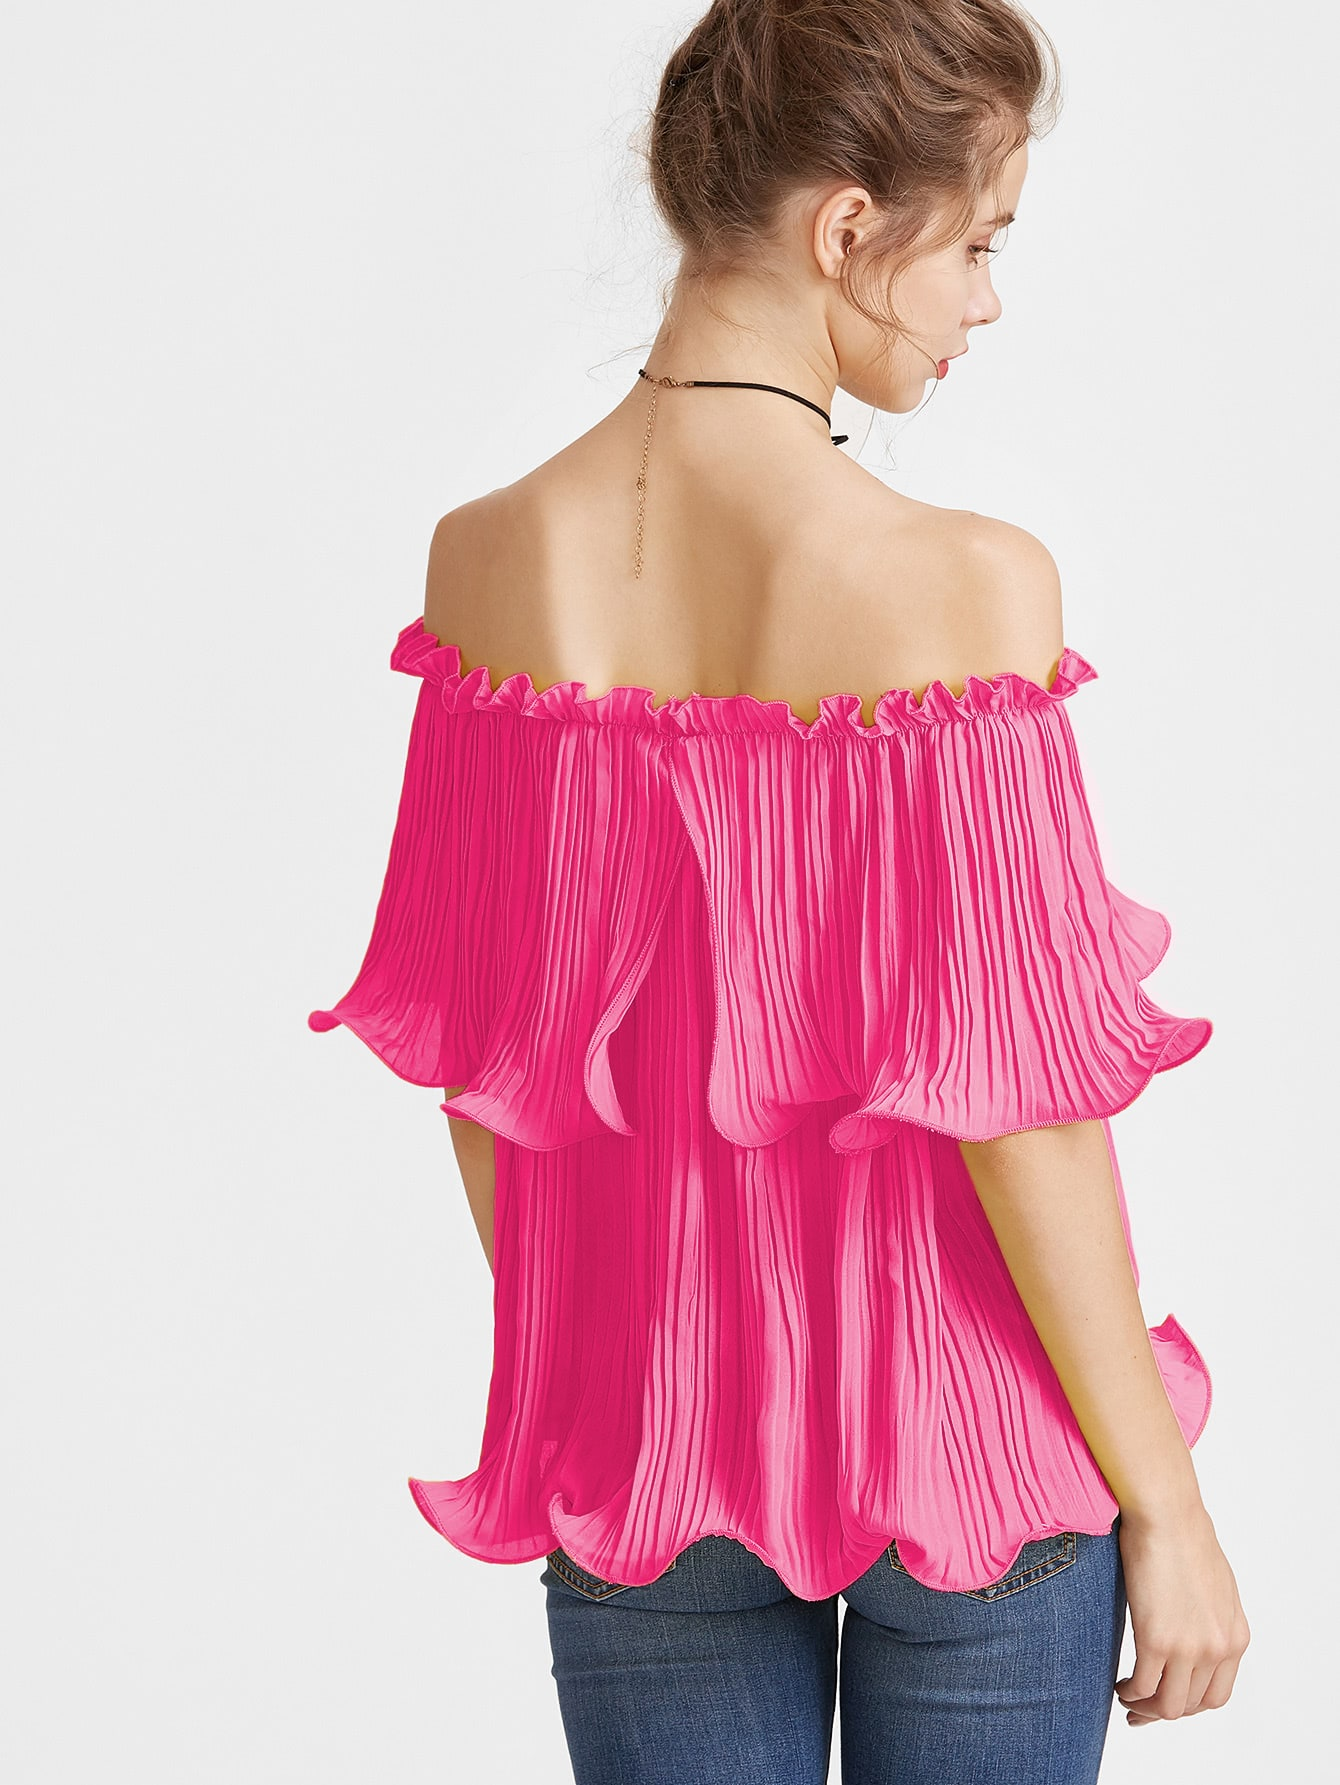 blouse170321462_2